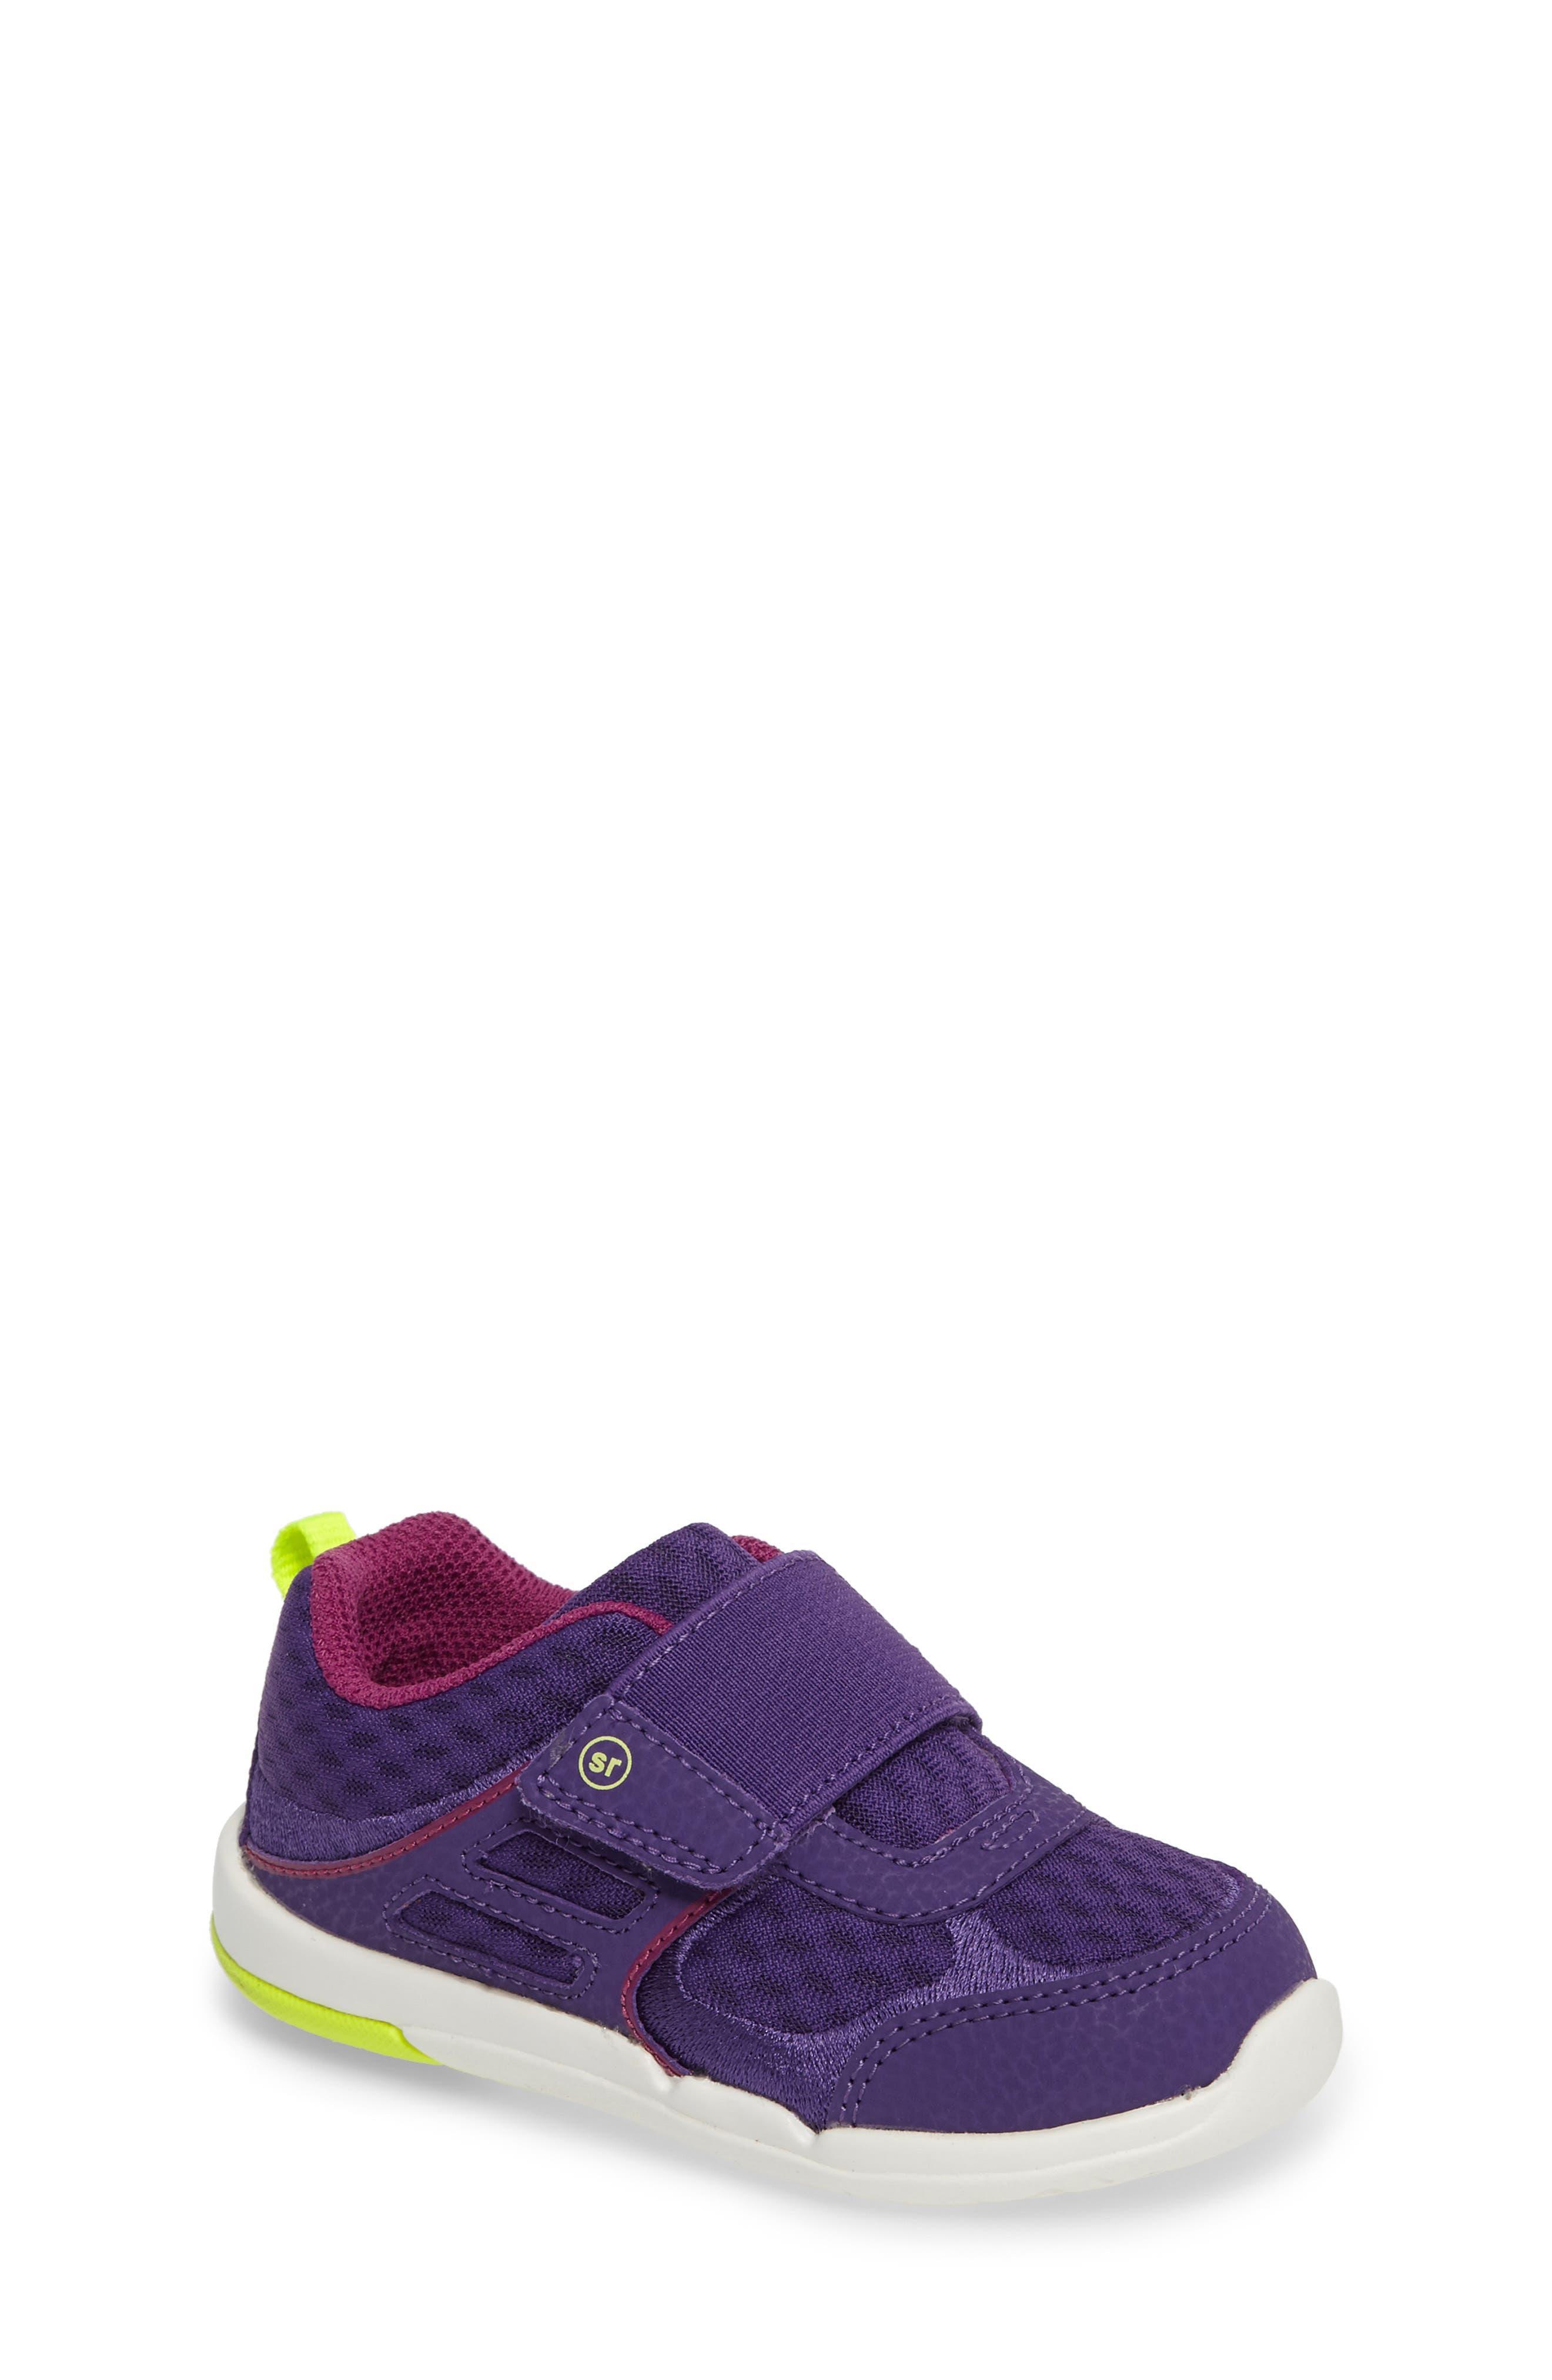 Casey Sneaker,                         Main,                         color, 500